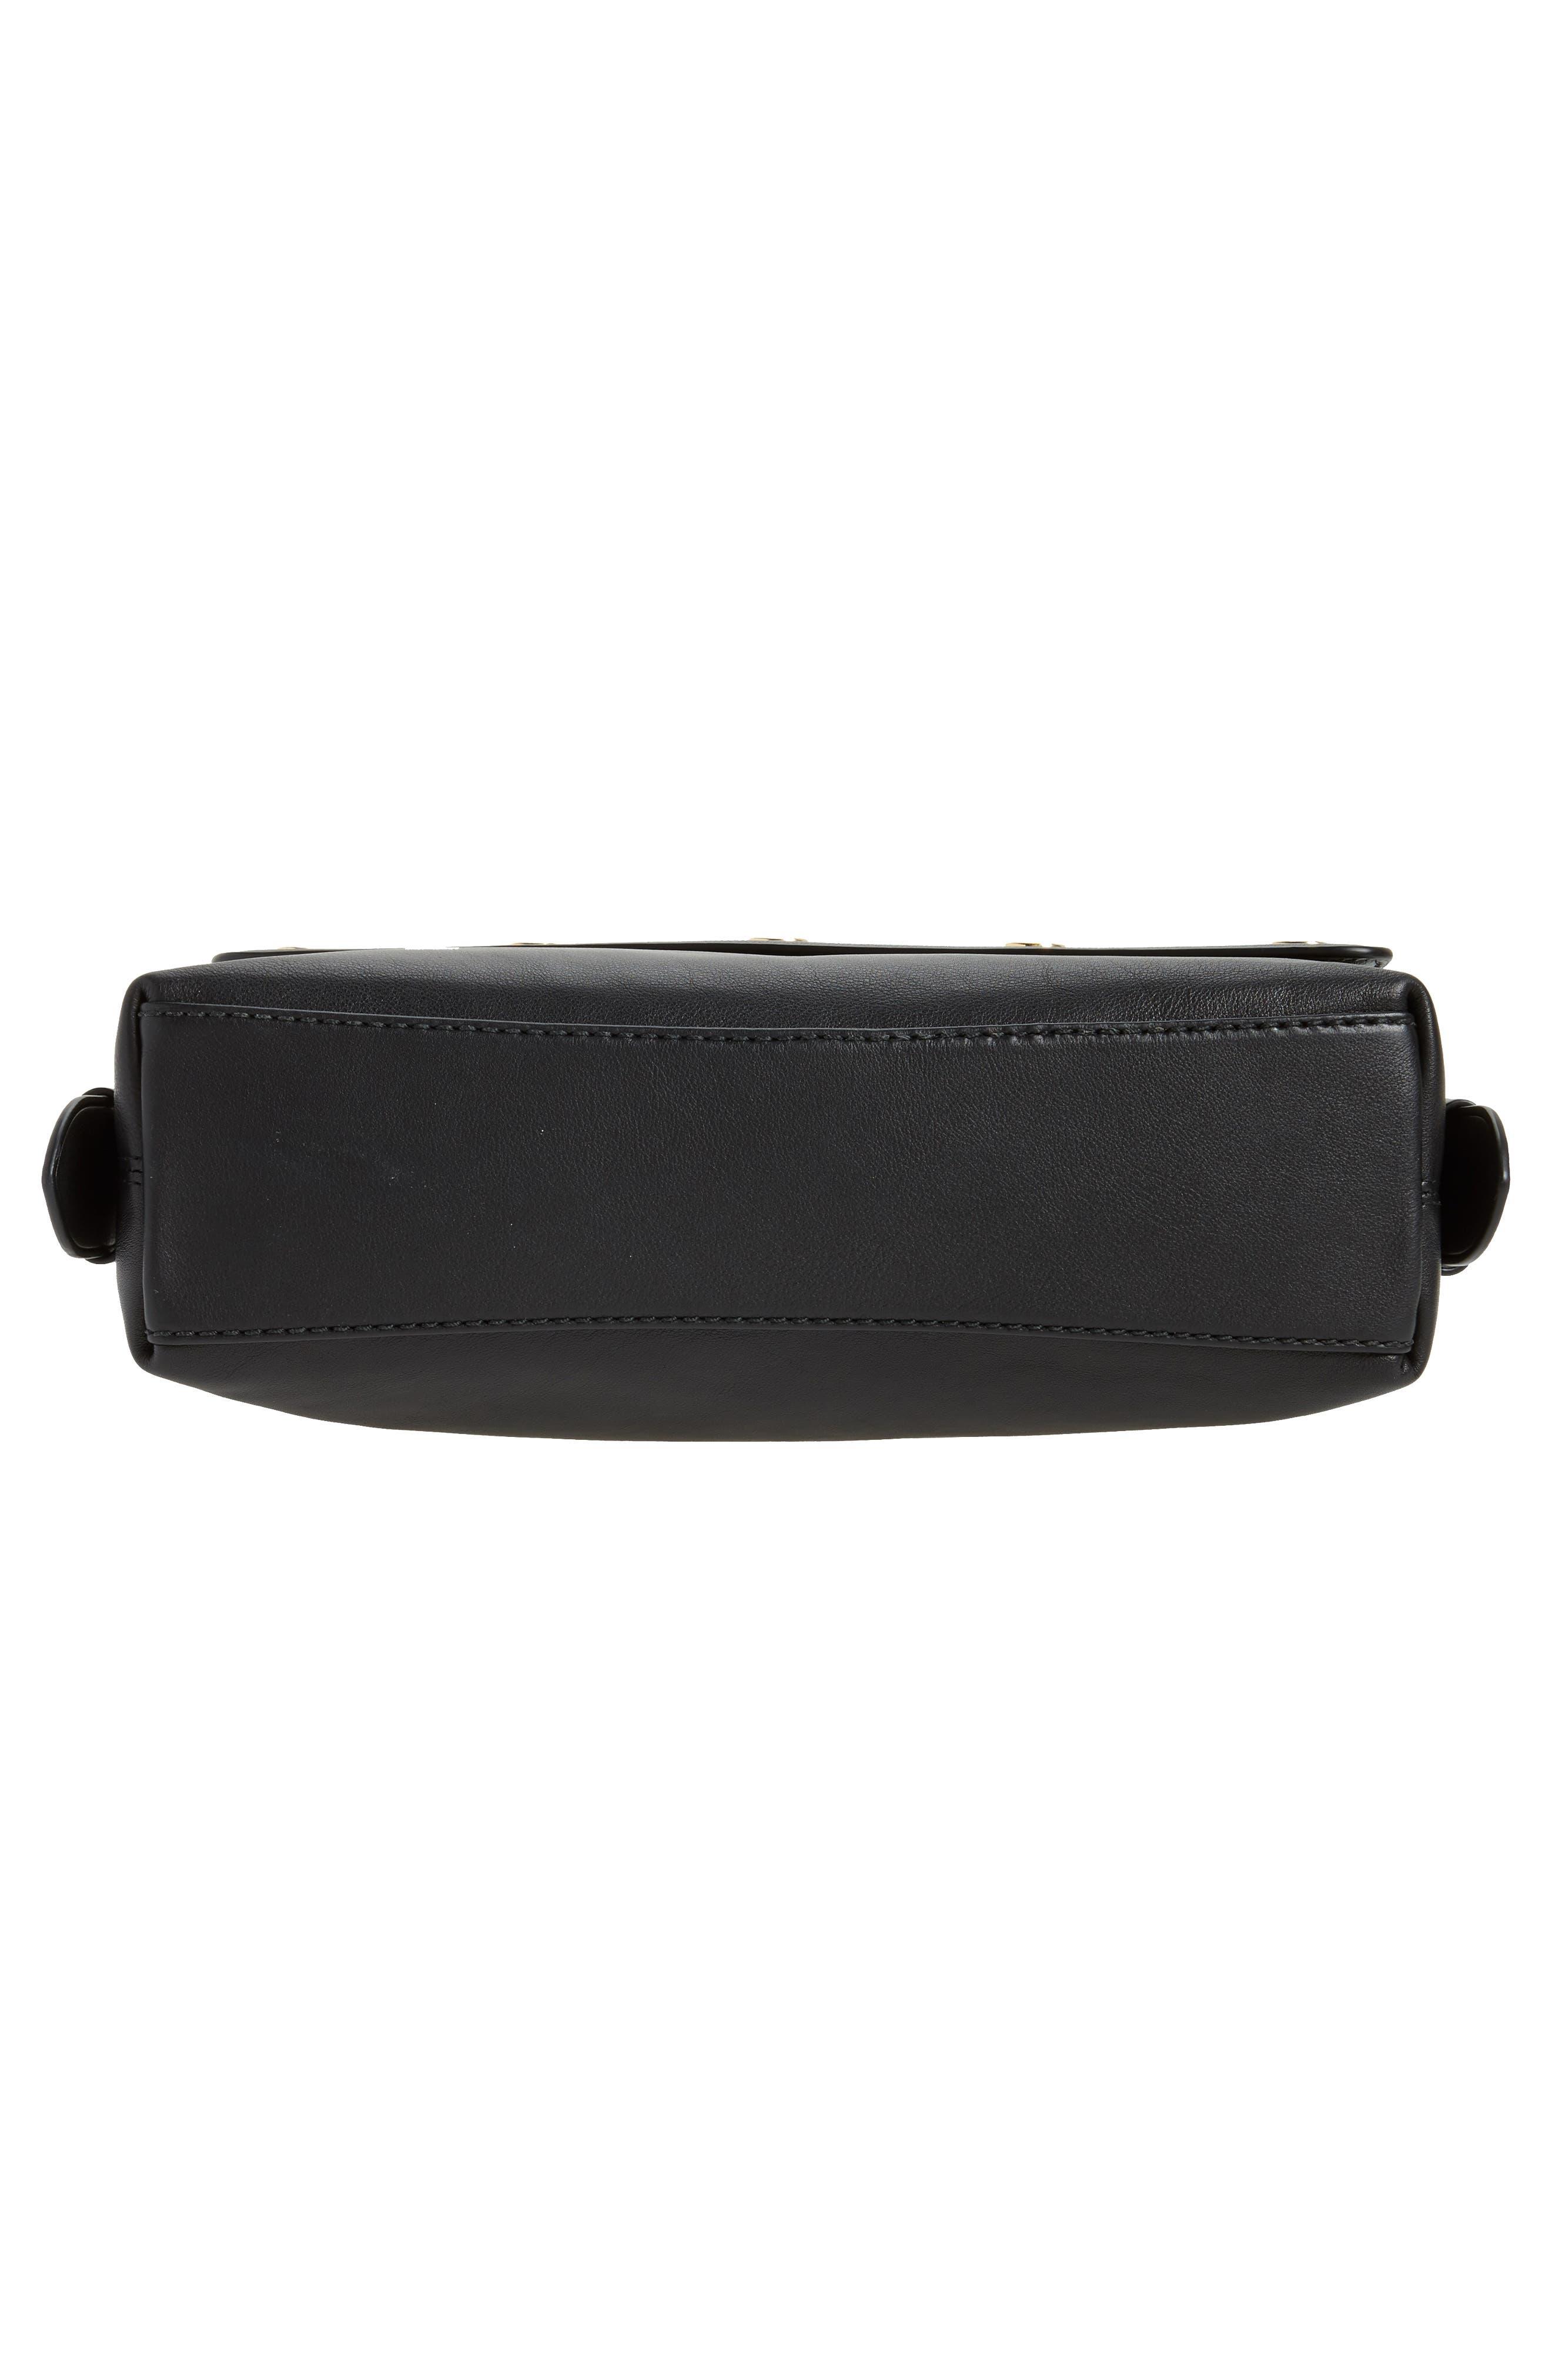 Downtown Stud Leather Shoulder Bag,                             Alternate thumbnail 5, color,                             Black